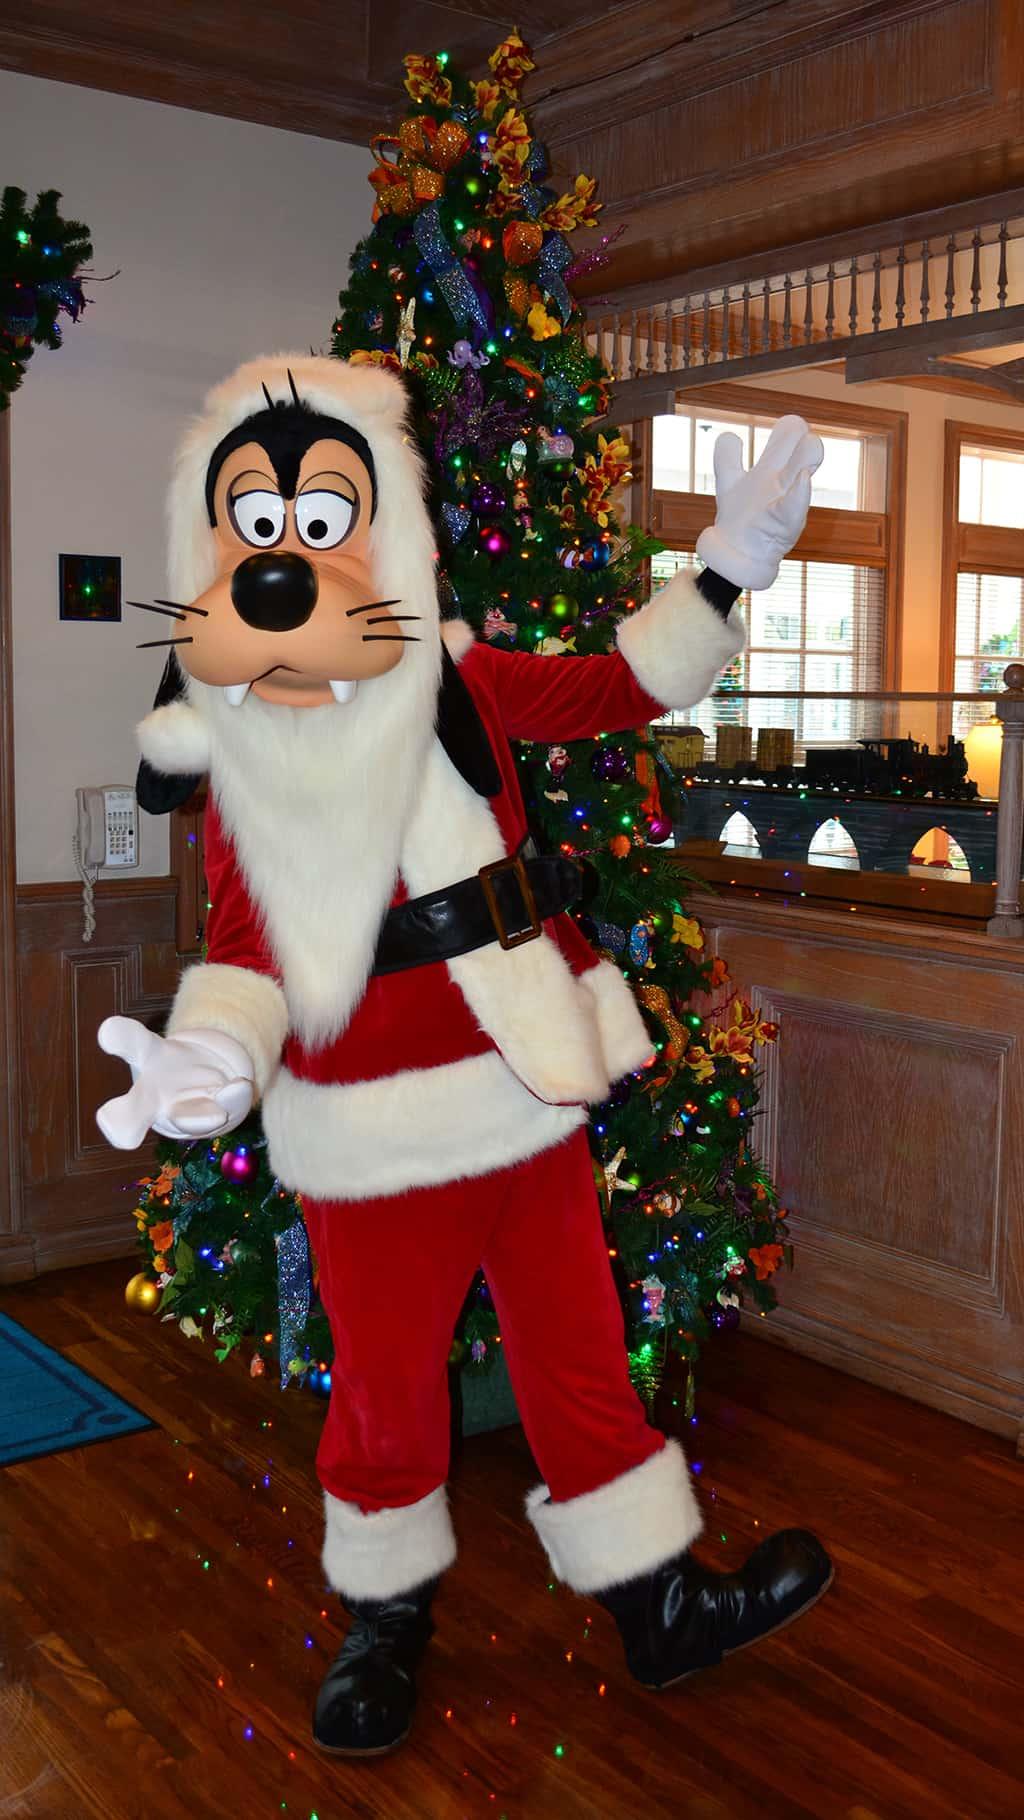 Walt Disney World Old Key West Resort Christmas Characters Santa Goofy Christmas Decor (8)